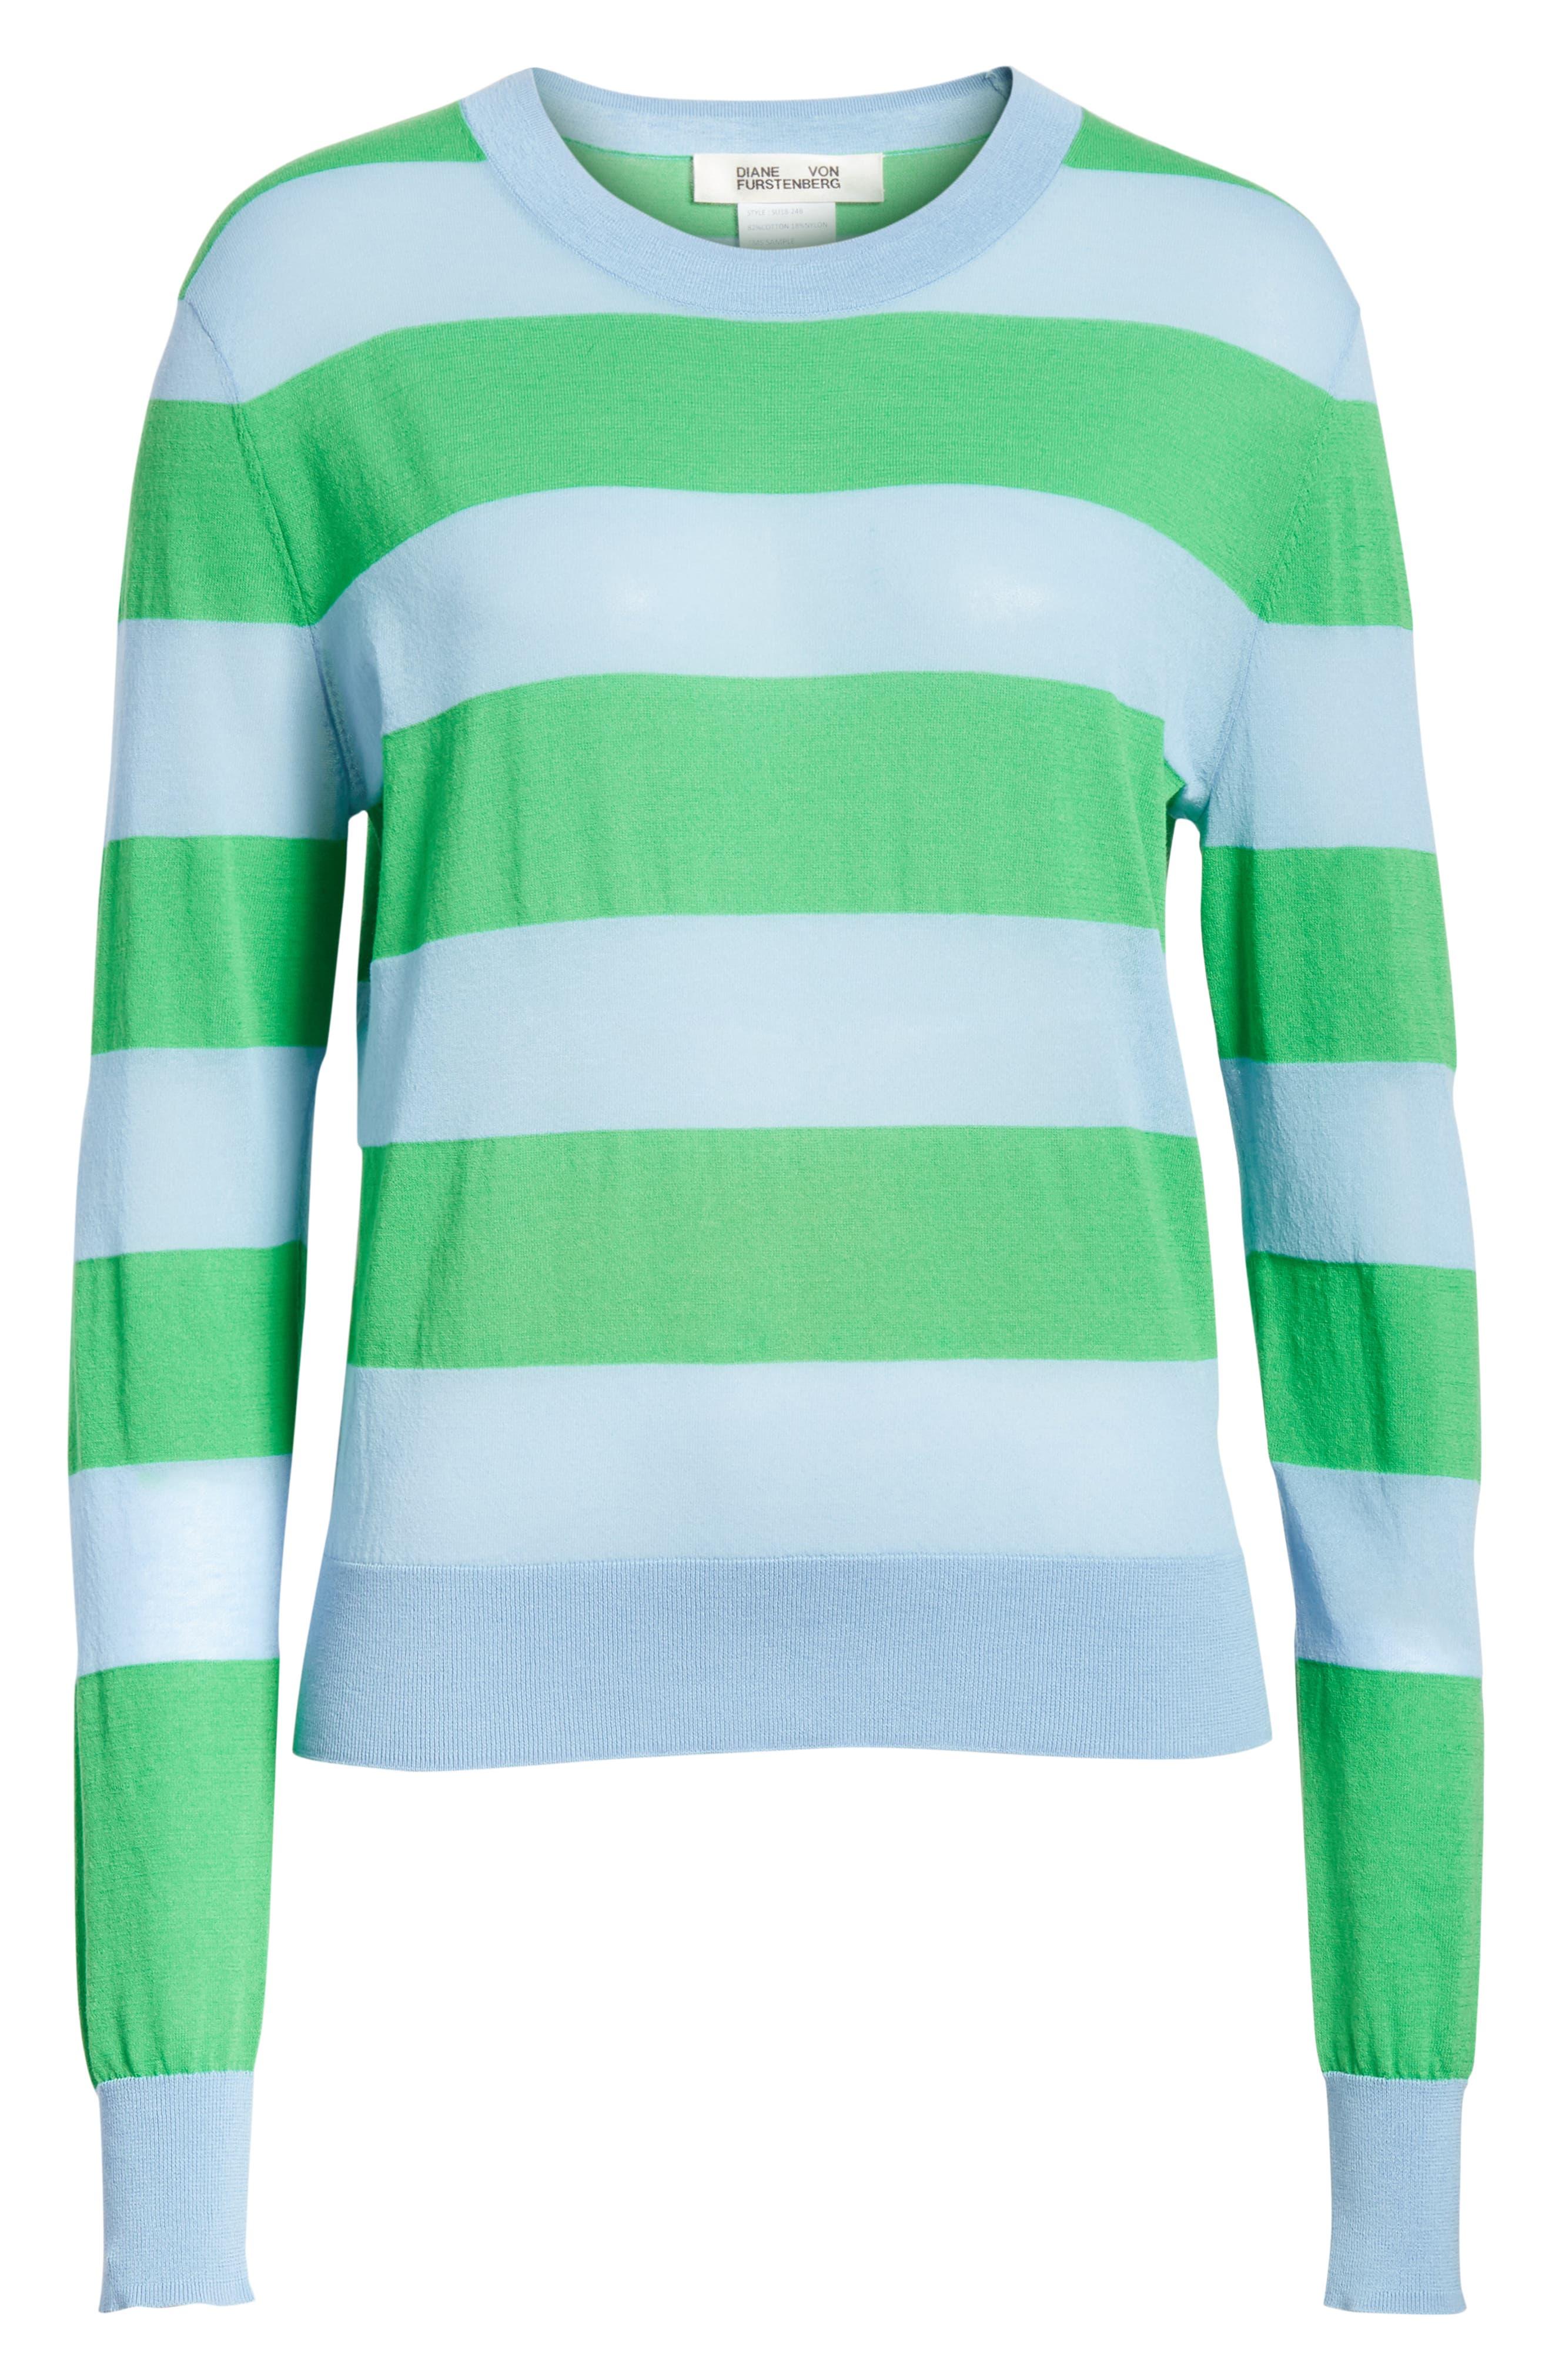 Diane von Furstenberg Colorblock Stripe Sweater,                             Alternate thumbnail 6, color,                             415